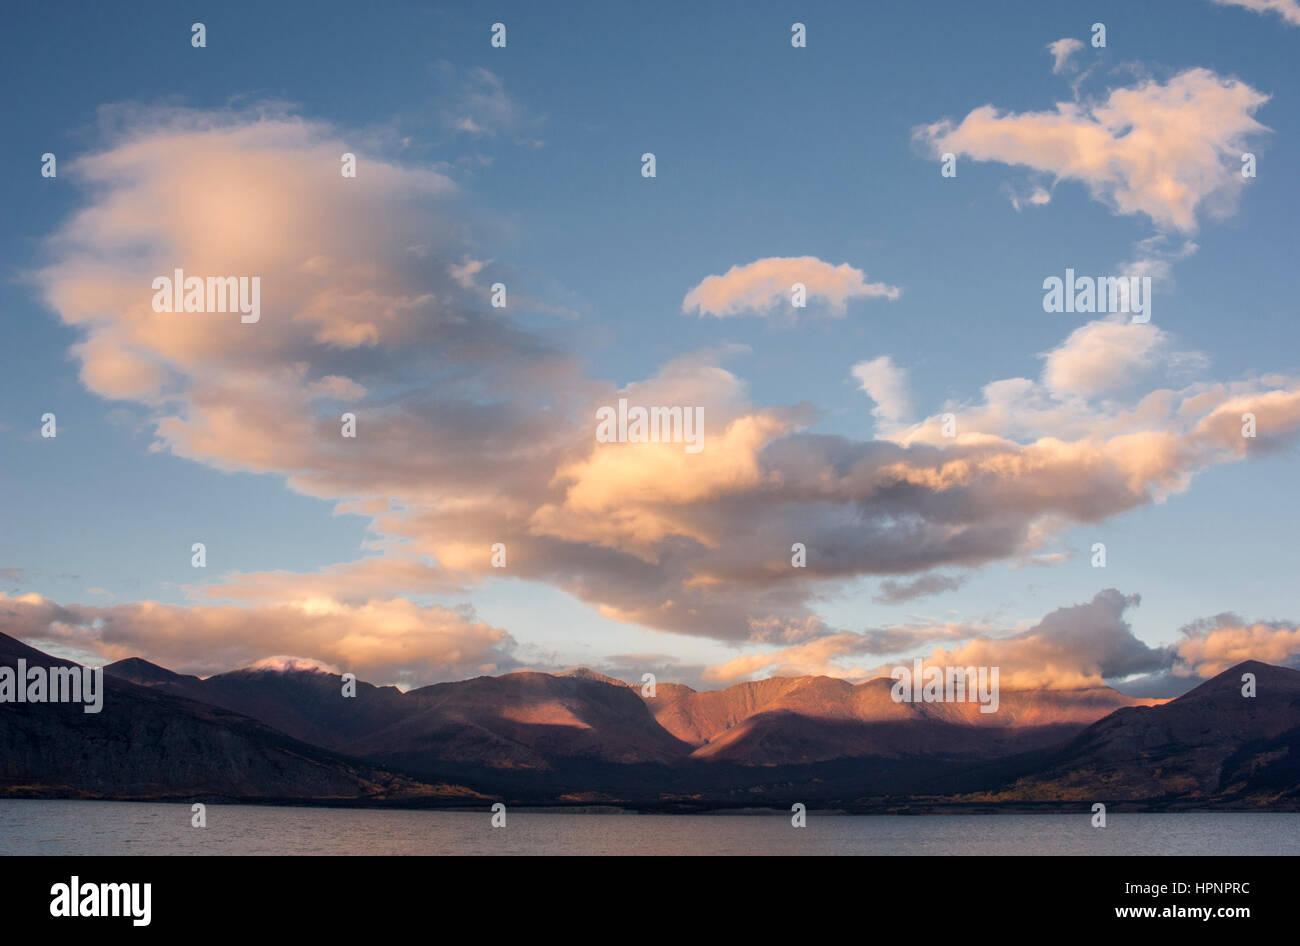 North America; Canada; Yukon Territory; Kluane Lake; Sunset; Autumn colors. - Stock Image